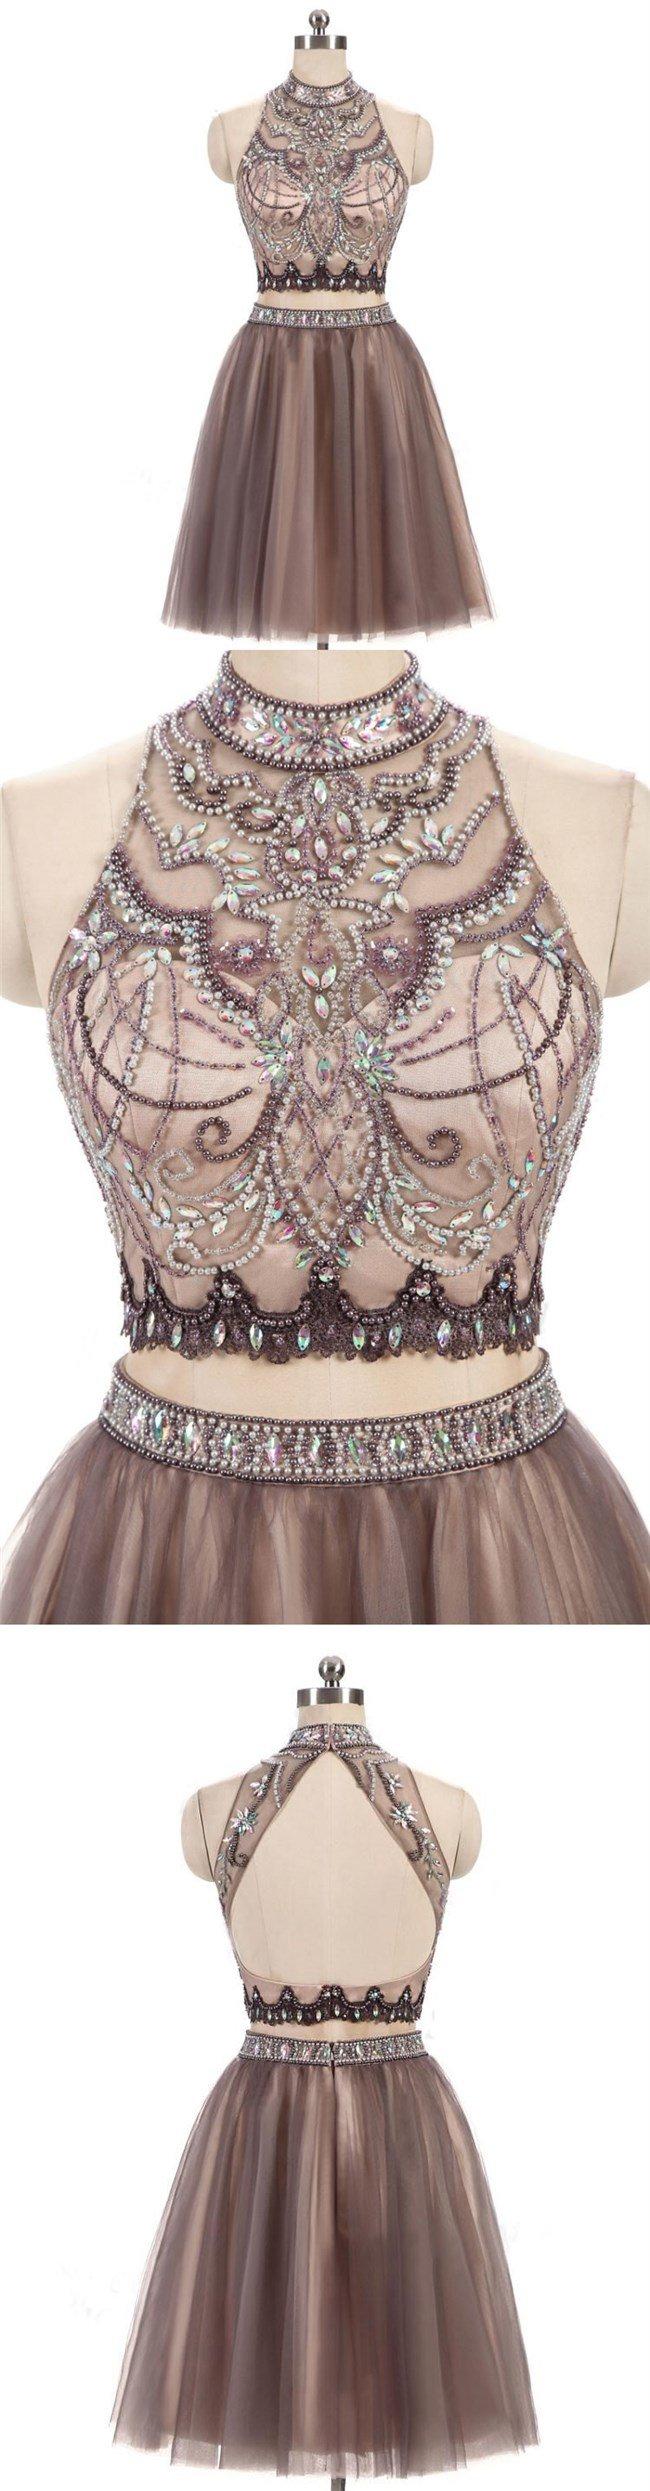 Tulle bateau neckline ball gown wedding dresswhite lace bead bridal